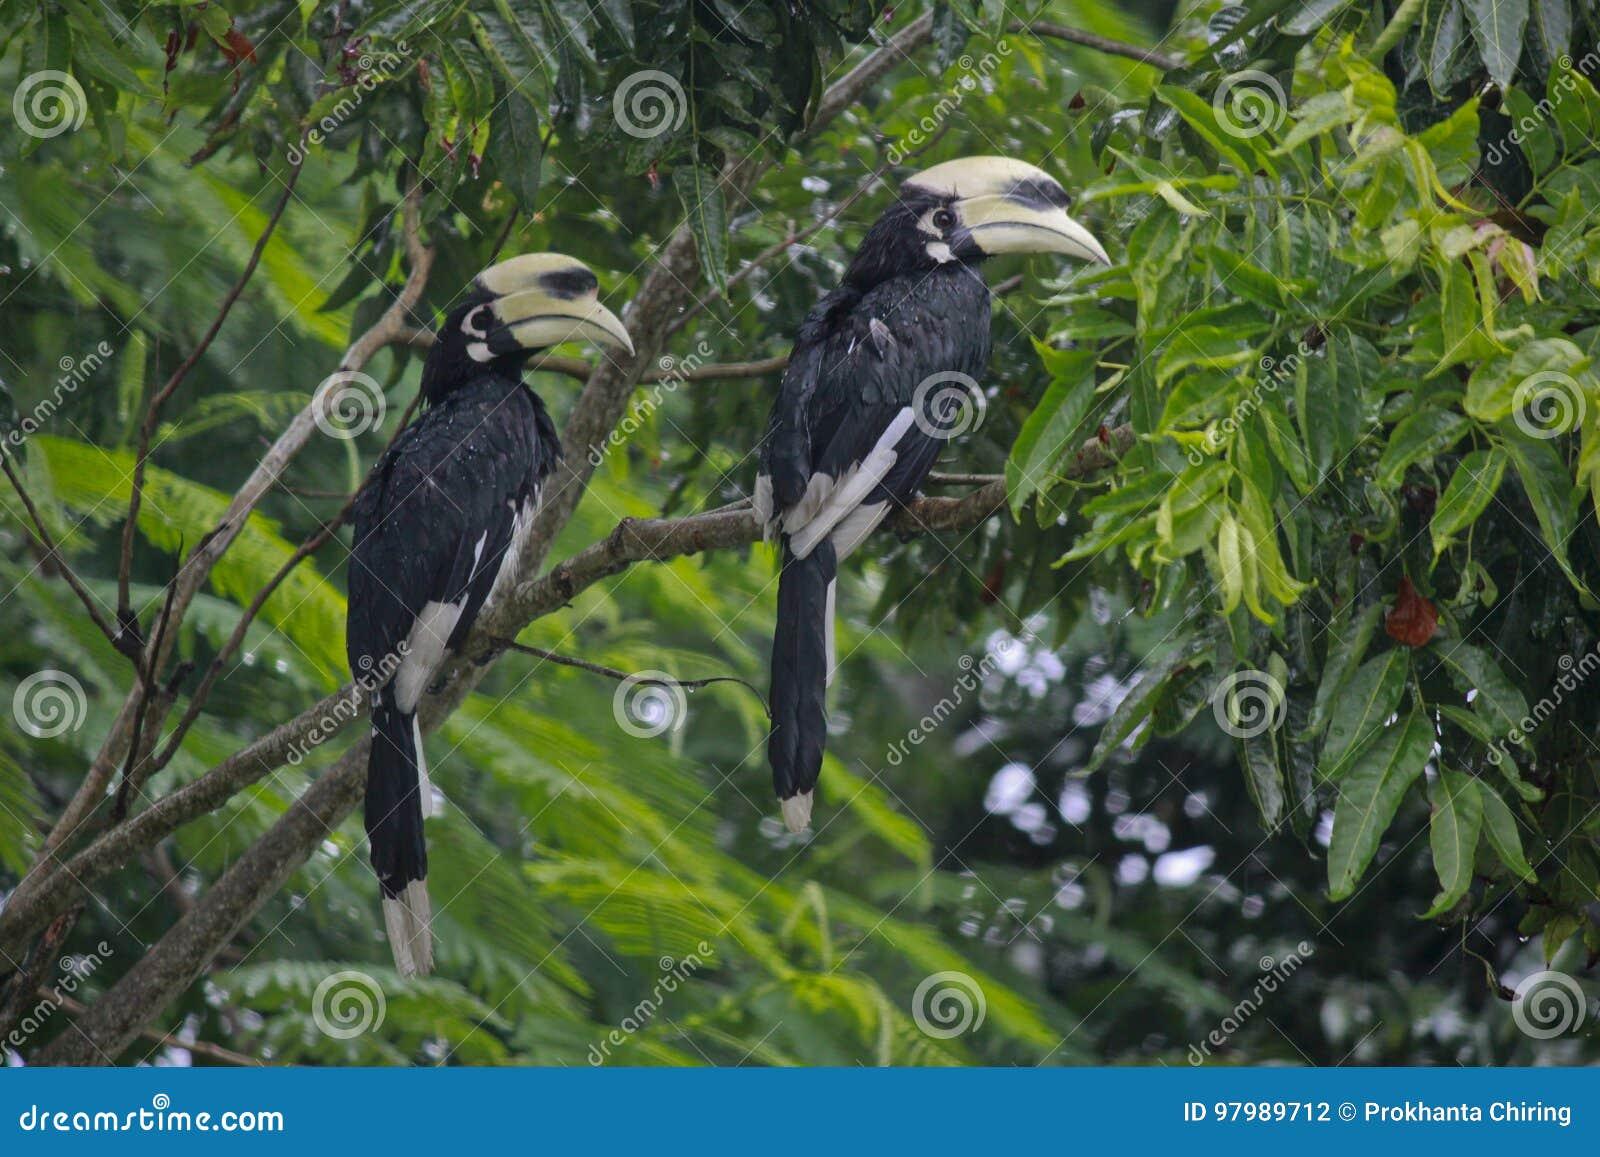 Oriented pied hornbill